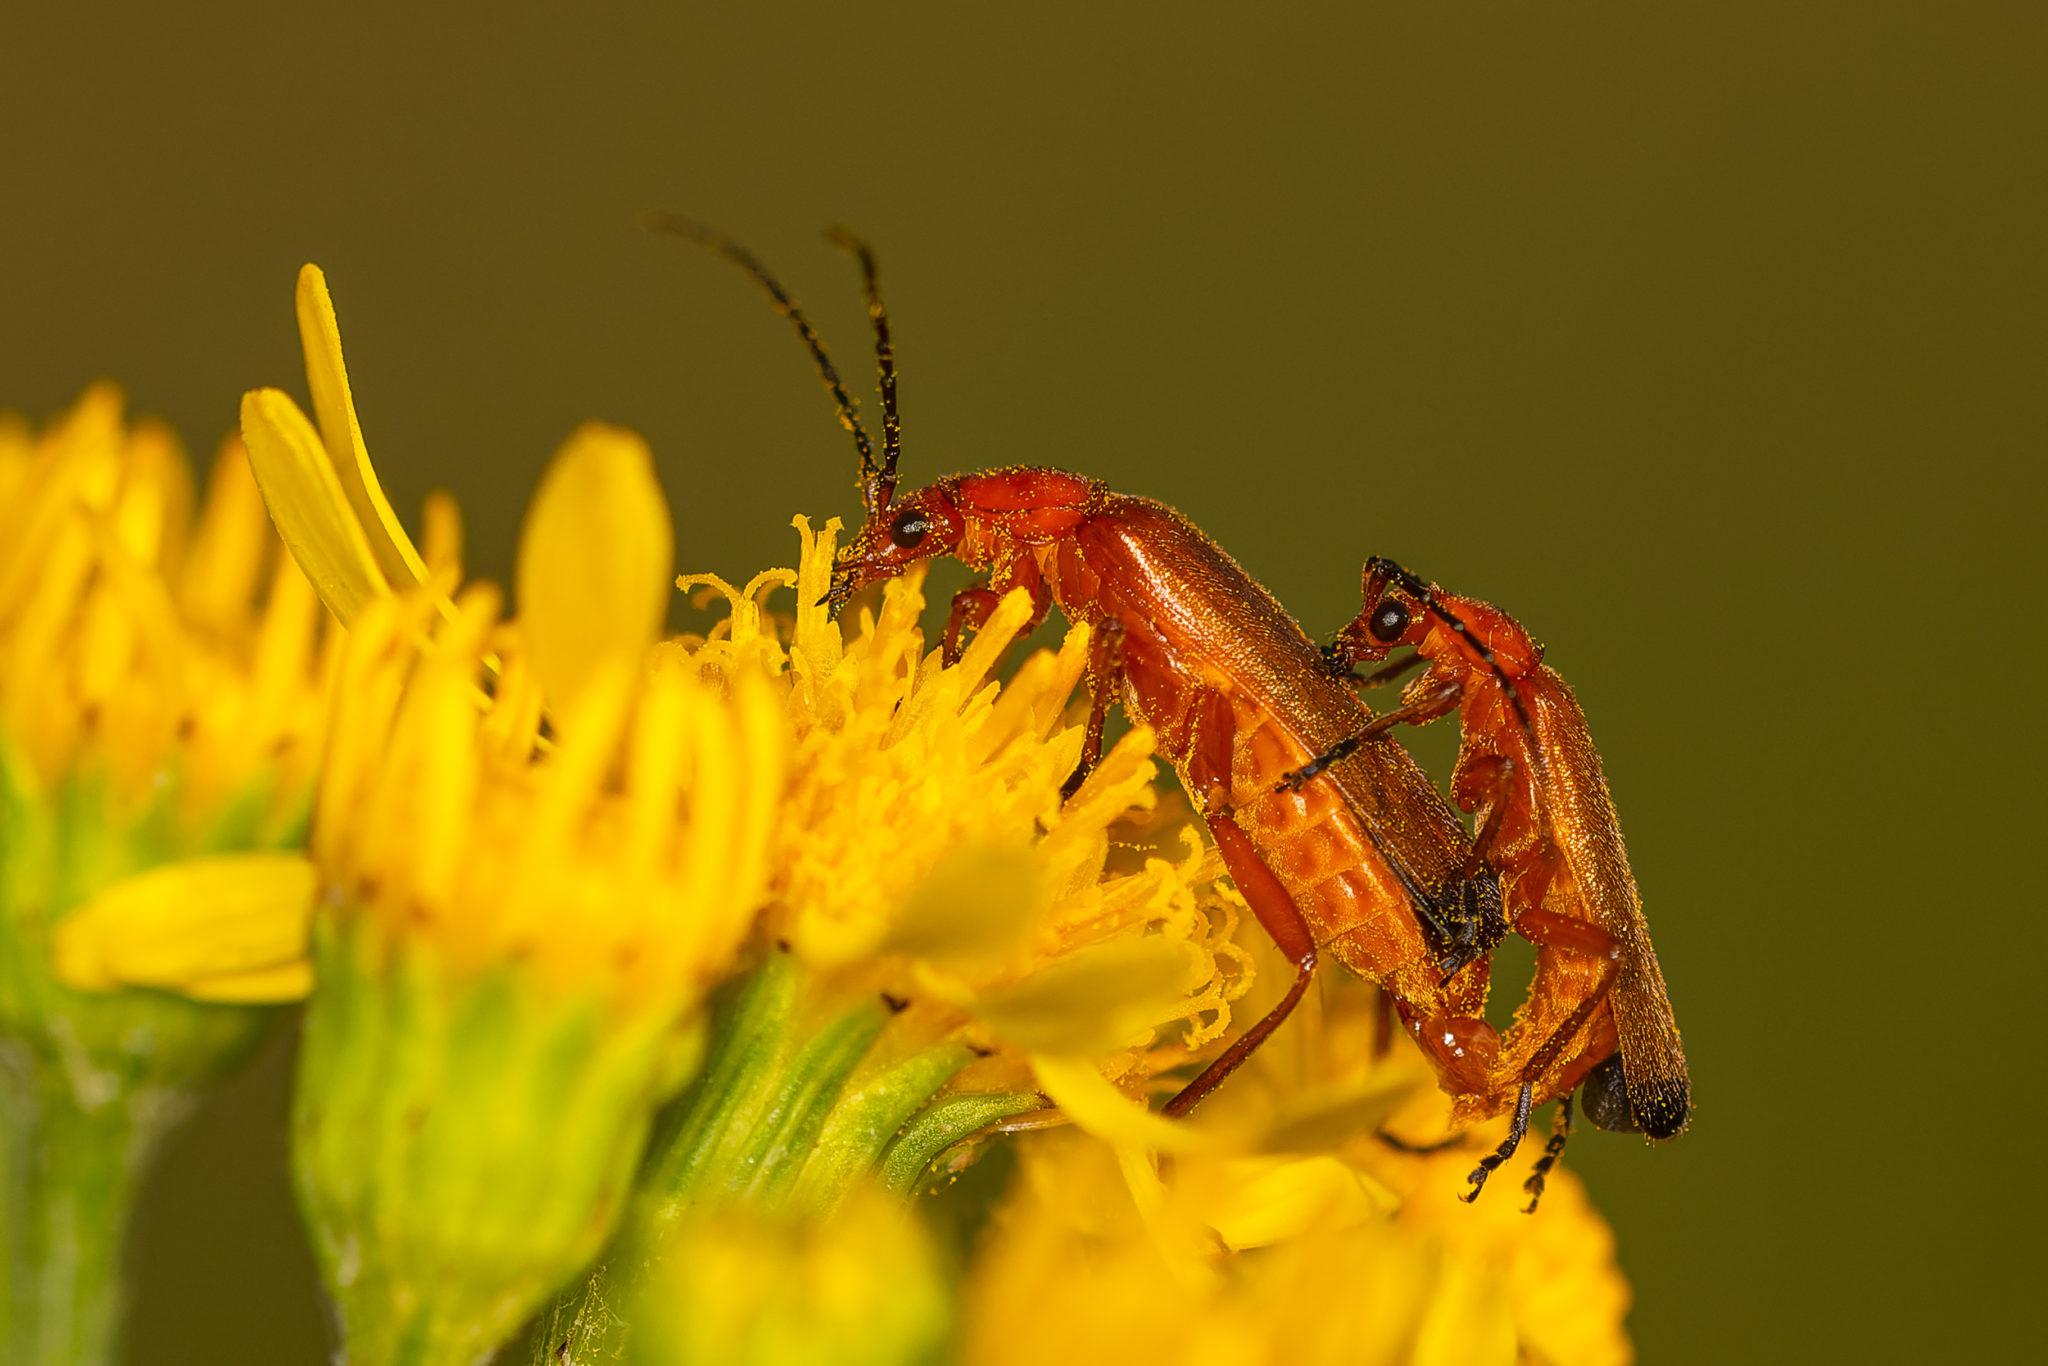 Rote oder Rotgelbe Weichkäfer (Rhagonycha fulva) , Naturfotografie Olaf & Sylvia Rentzsch